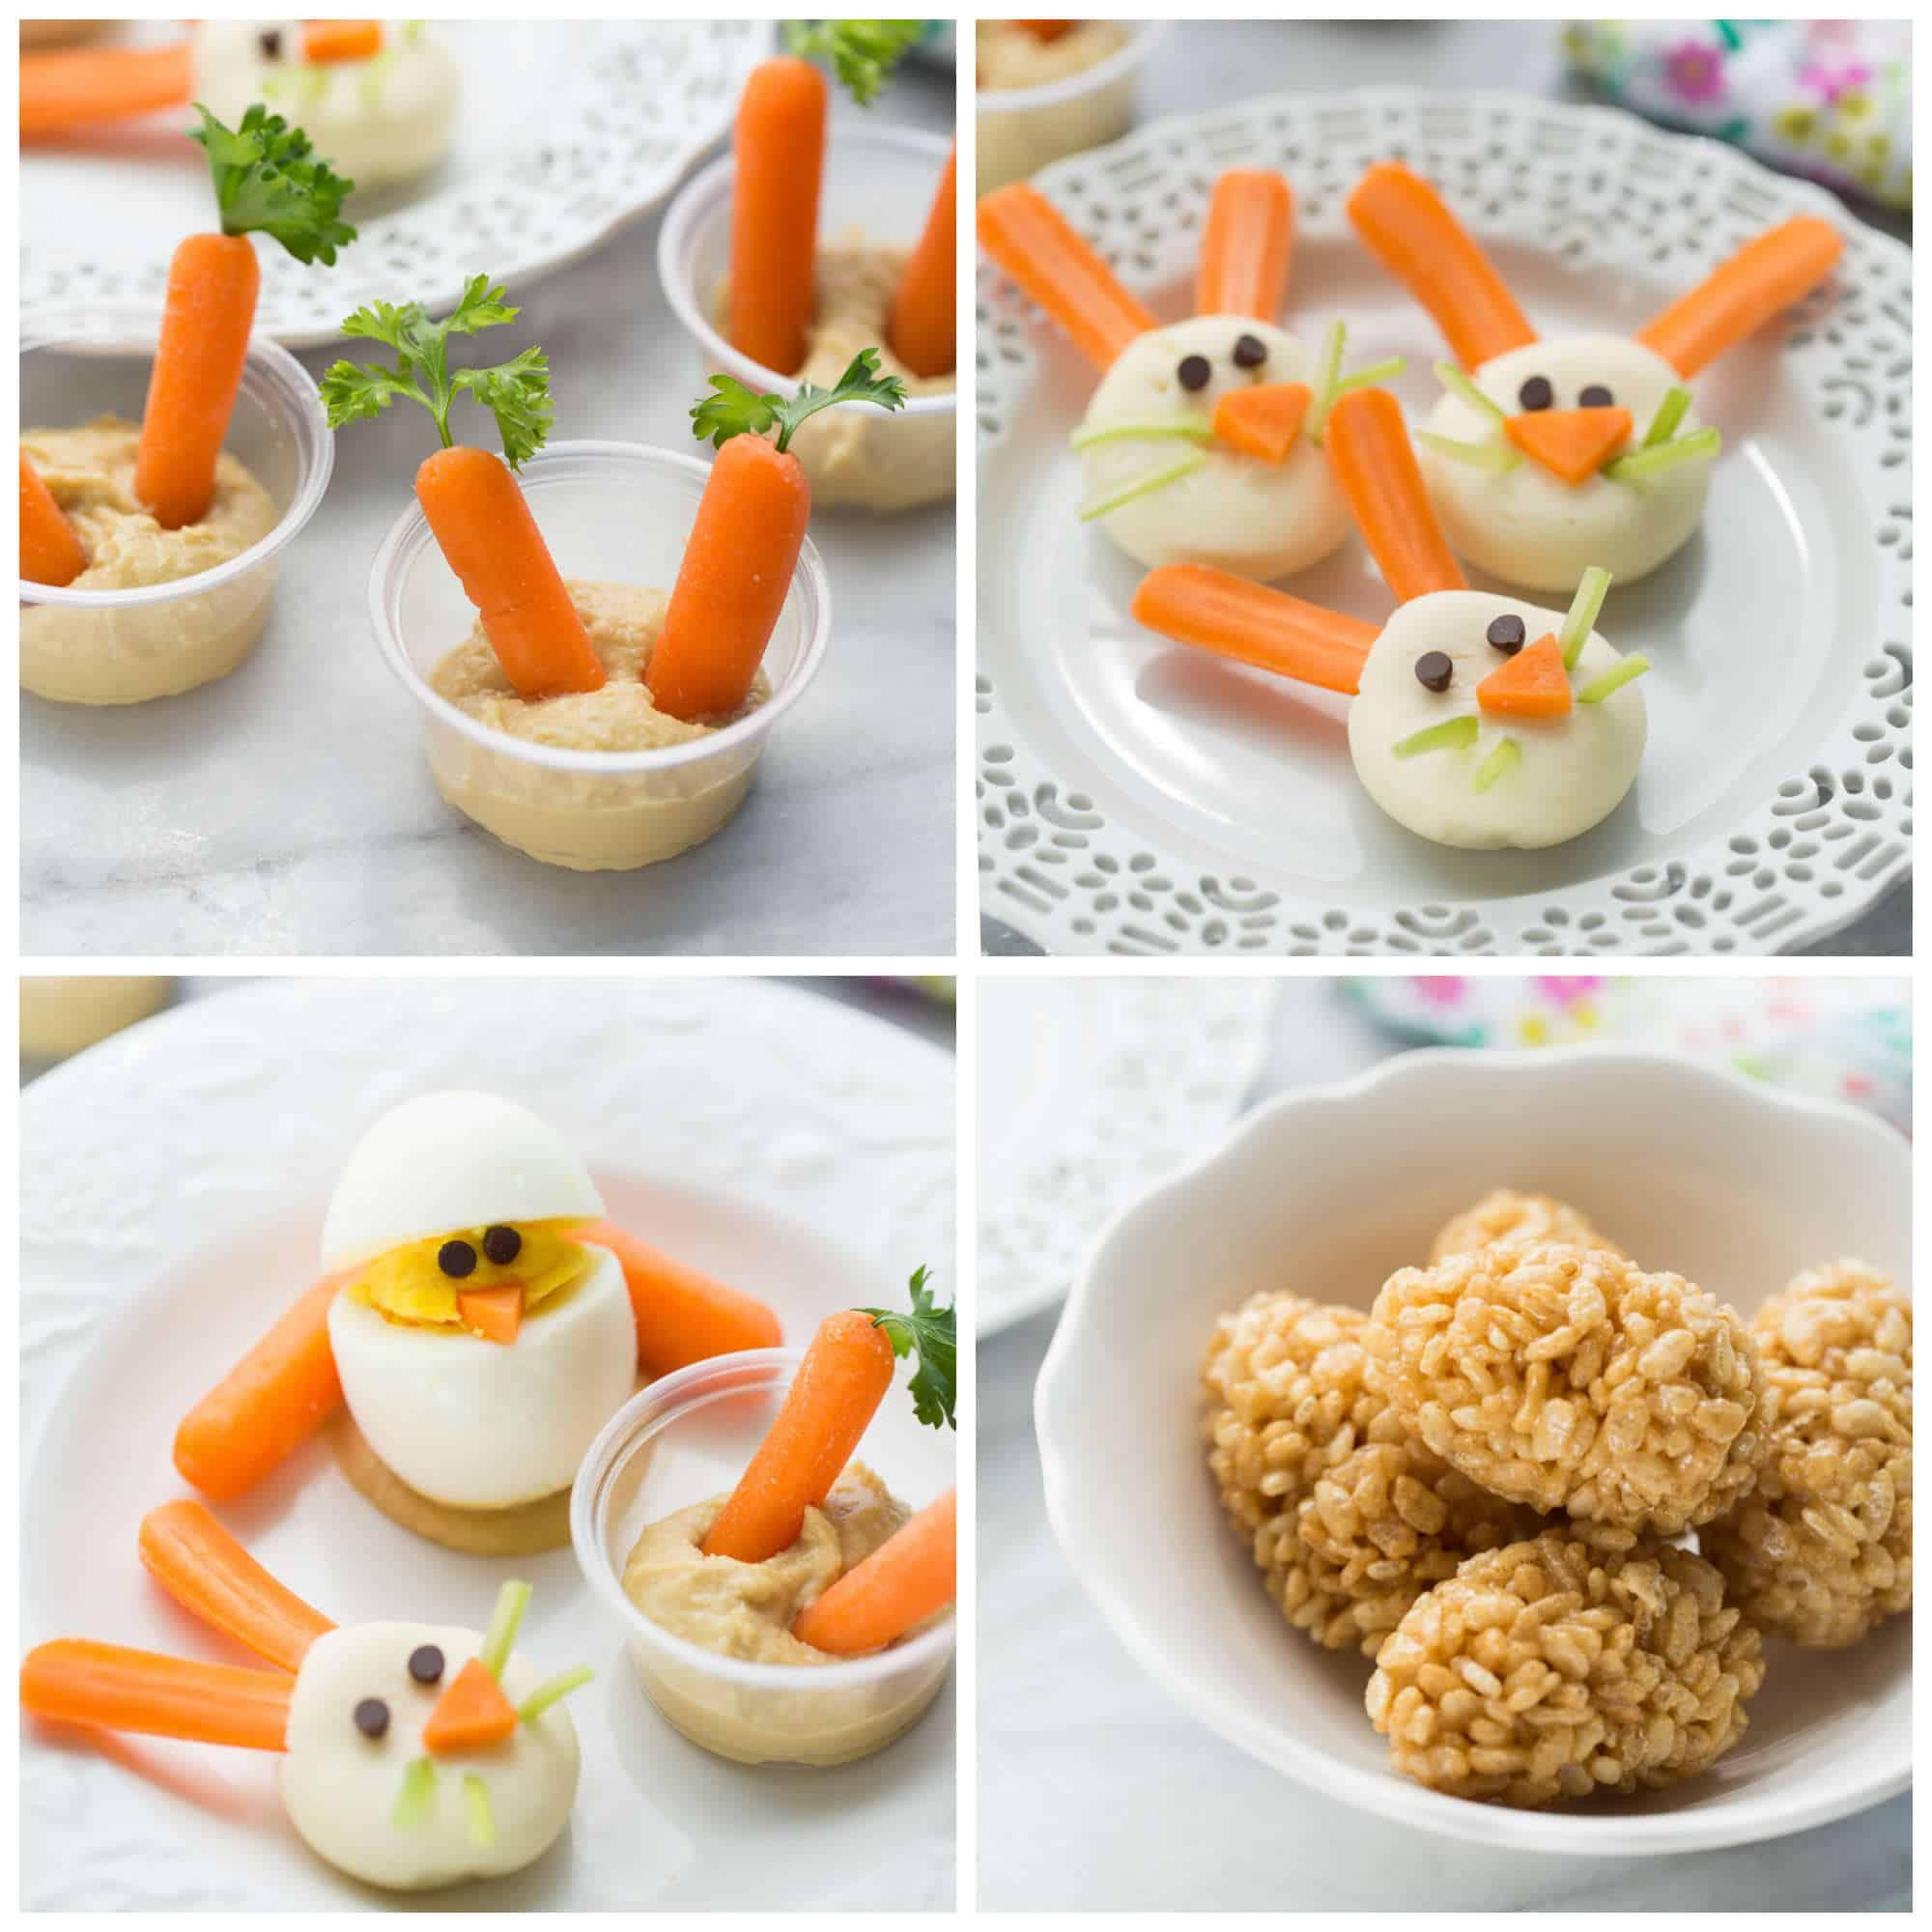 4 Healthy Kids Easter Snacks - Meaningful Eats